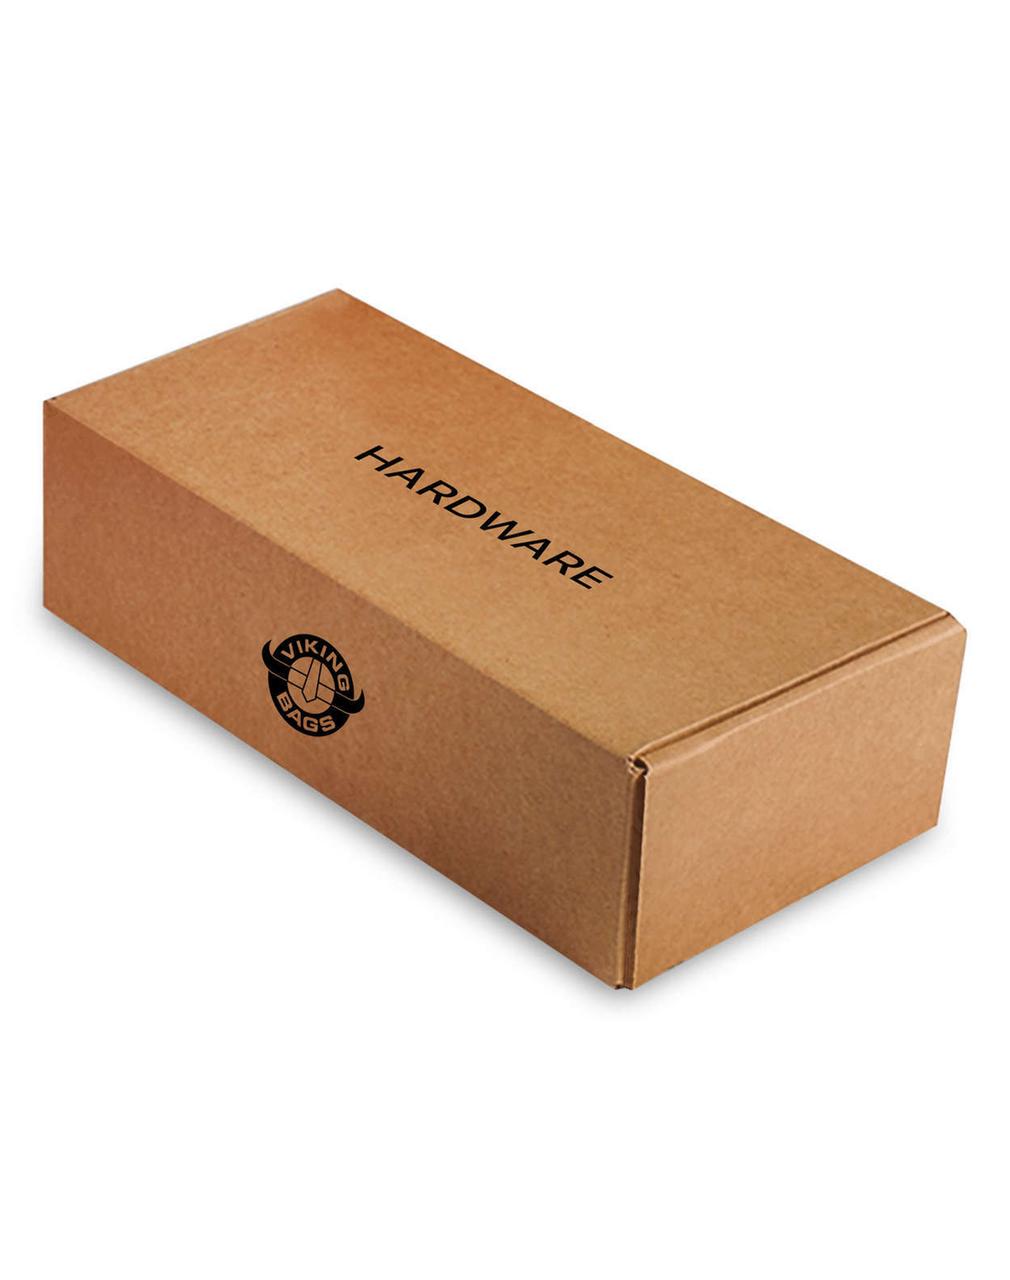 Honda 1500 Valkyrie Interstate Viking Thor Series Small Leather Motorcycle Saddlebags Box